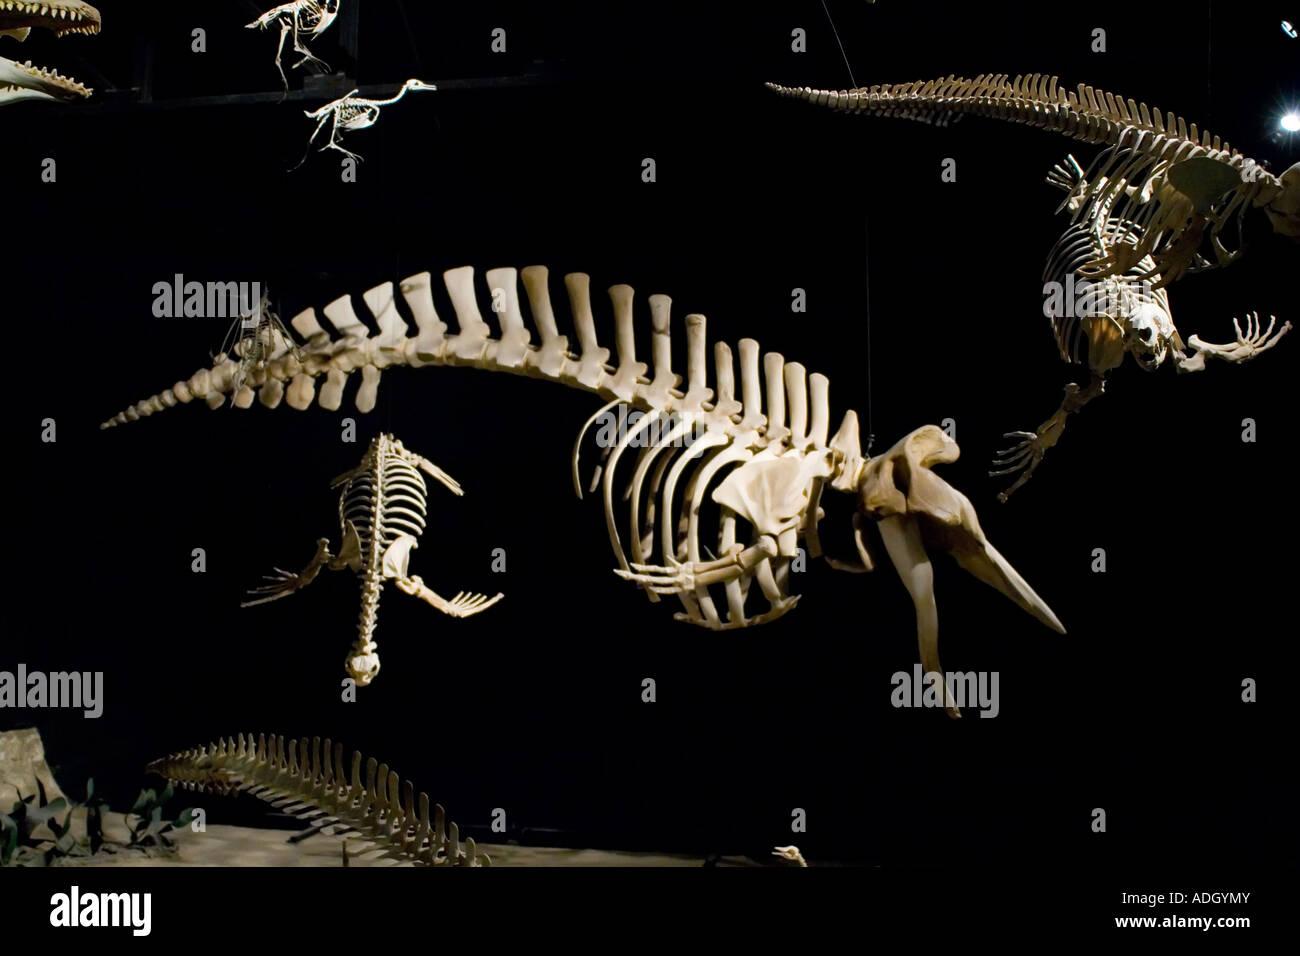 Egidio Feruglio paleontology museum - Stock Image